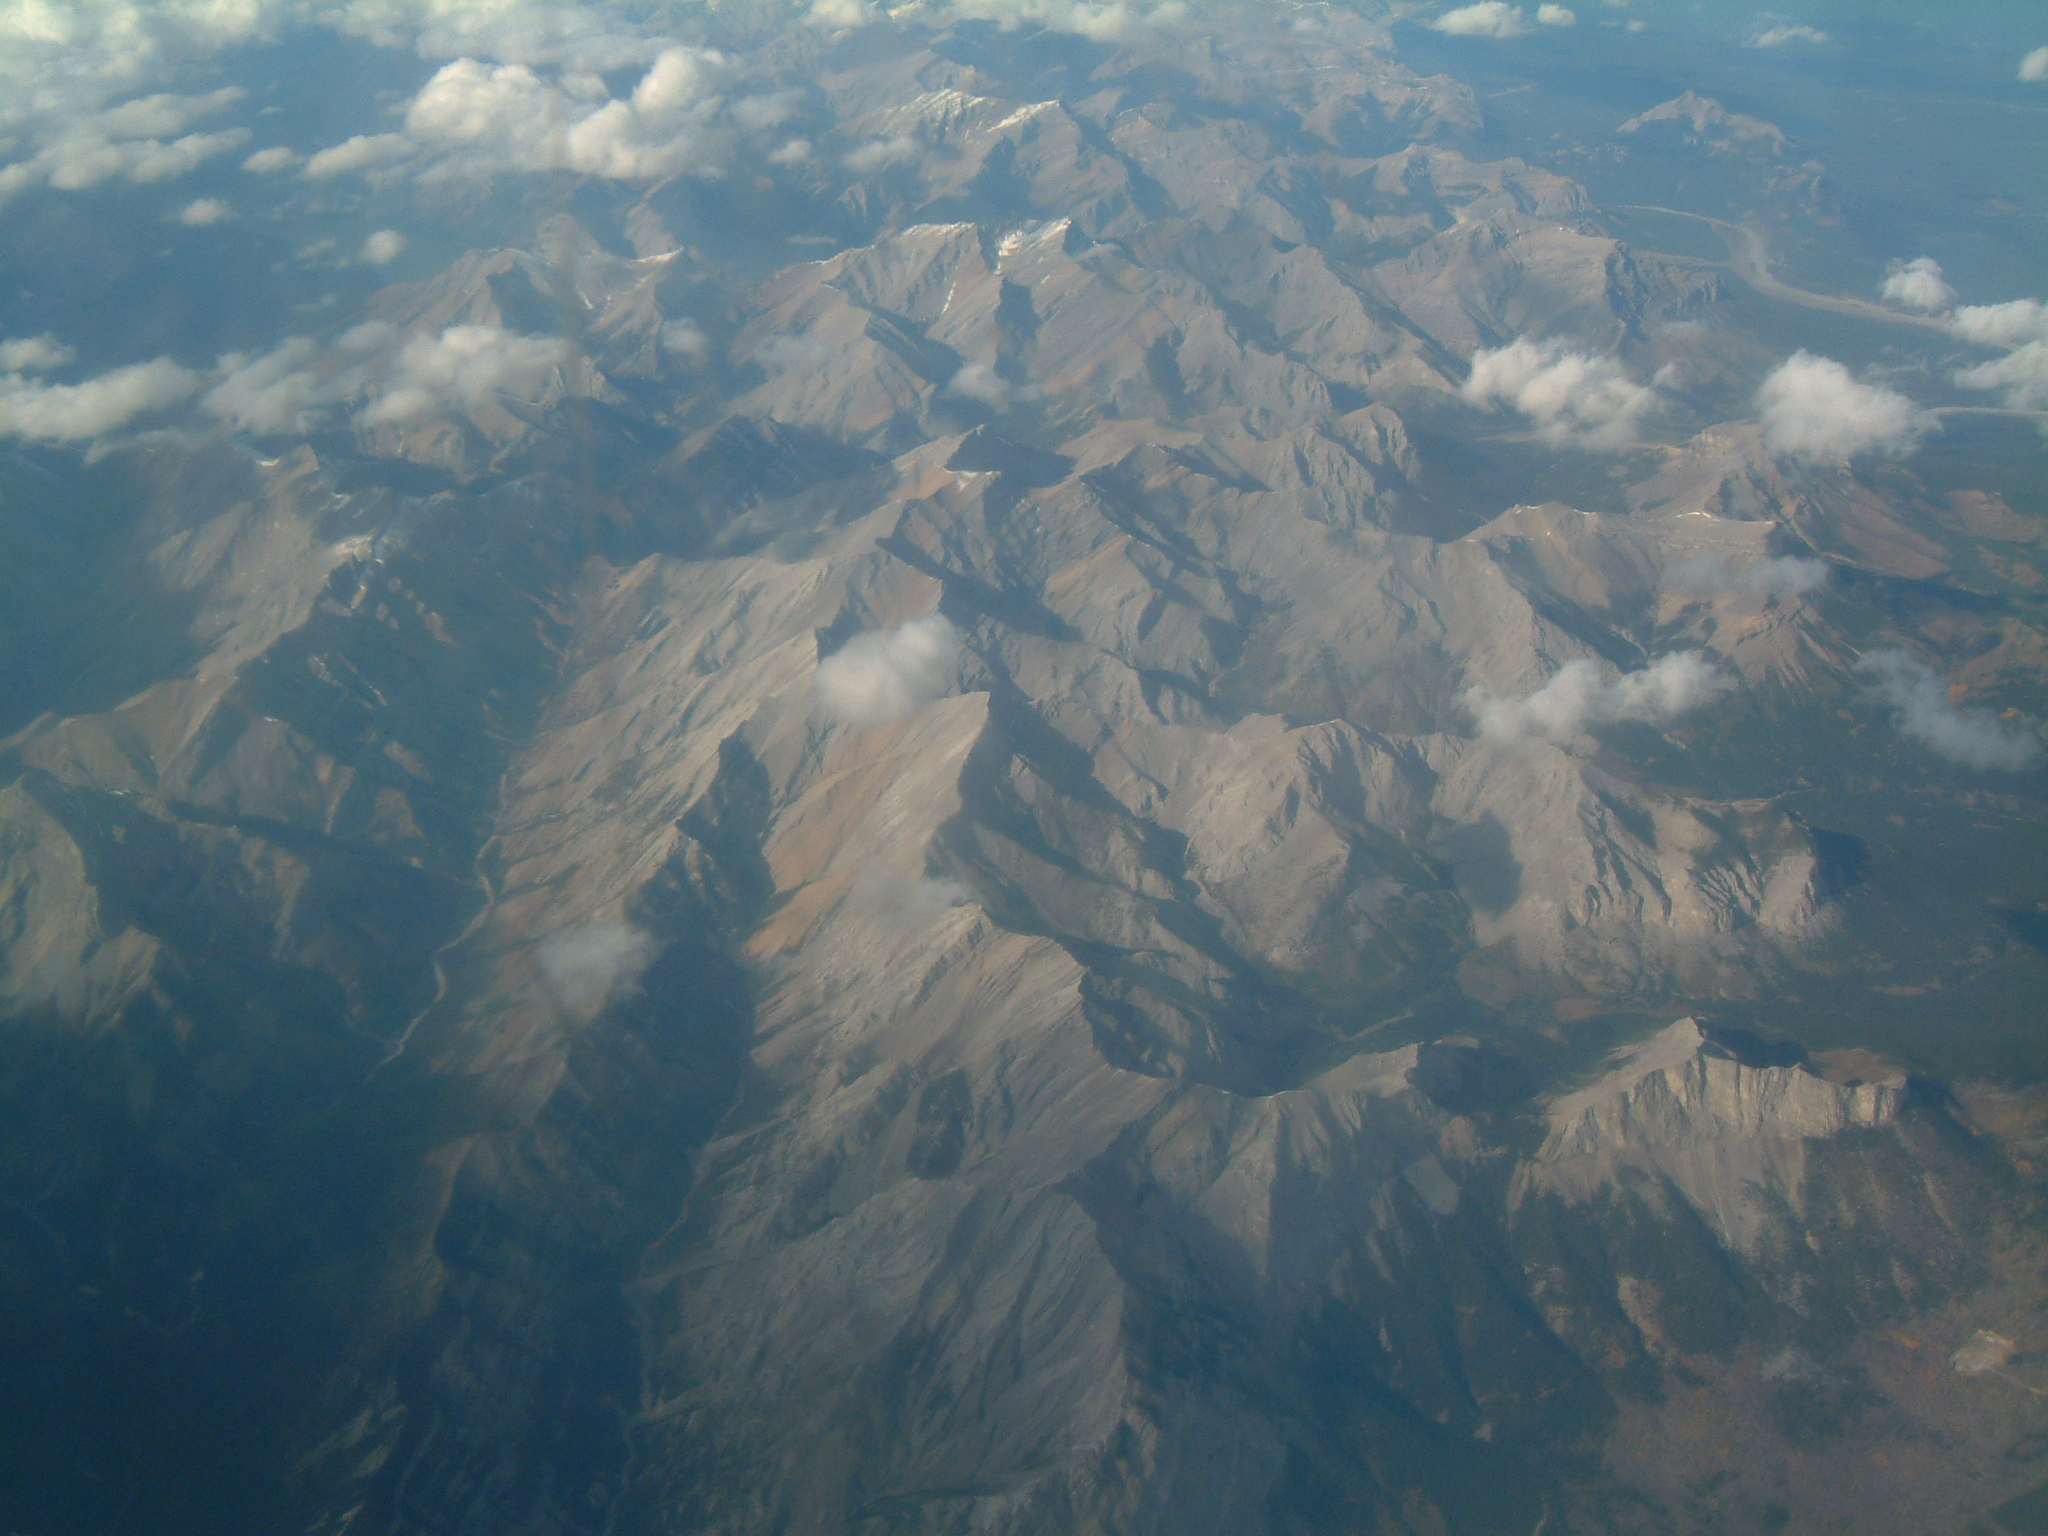 Aerial of Canadian rockies, Alberta, Aerial, Bspo07, Canada, Clouds, HQ Photo